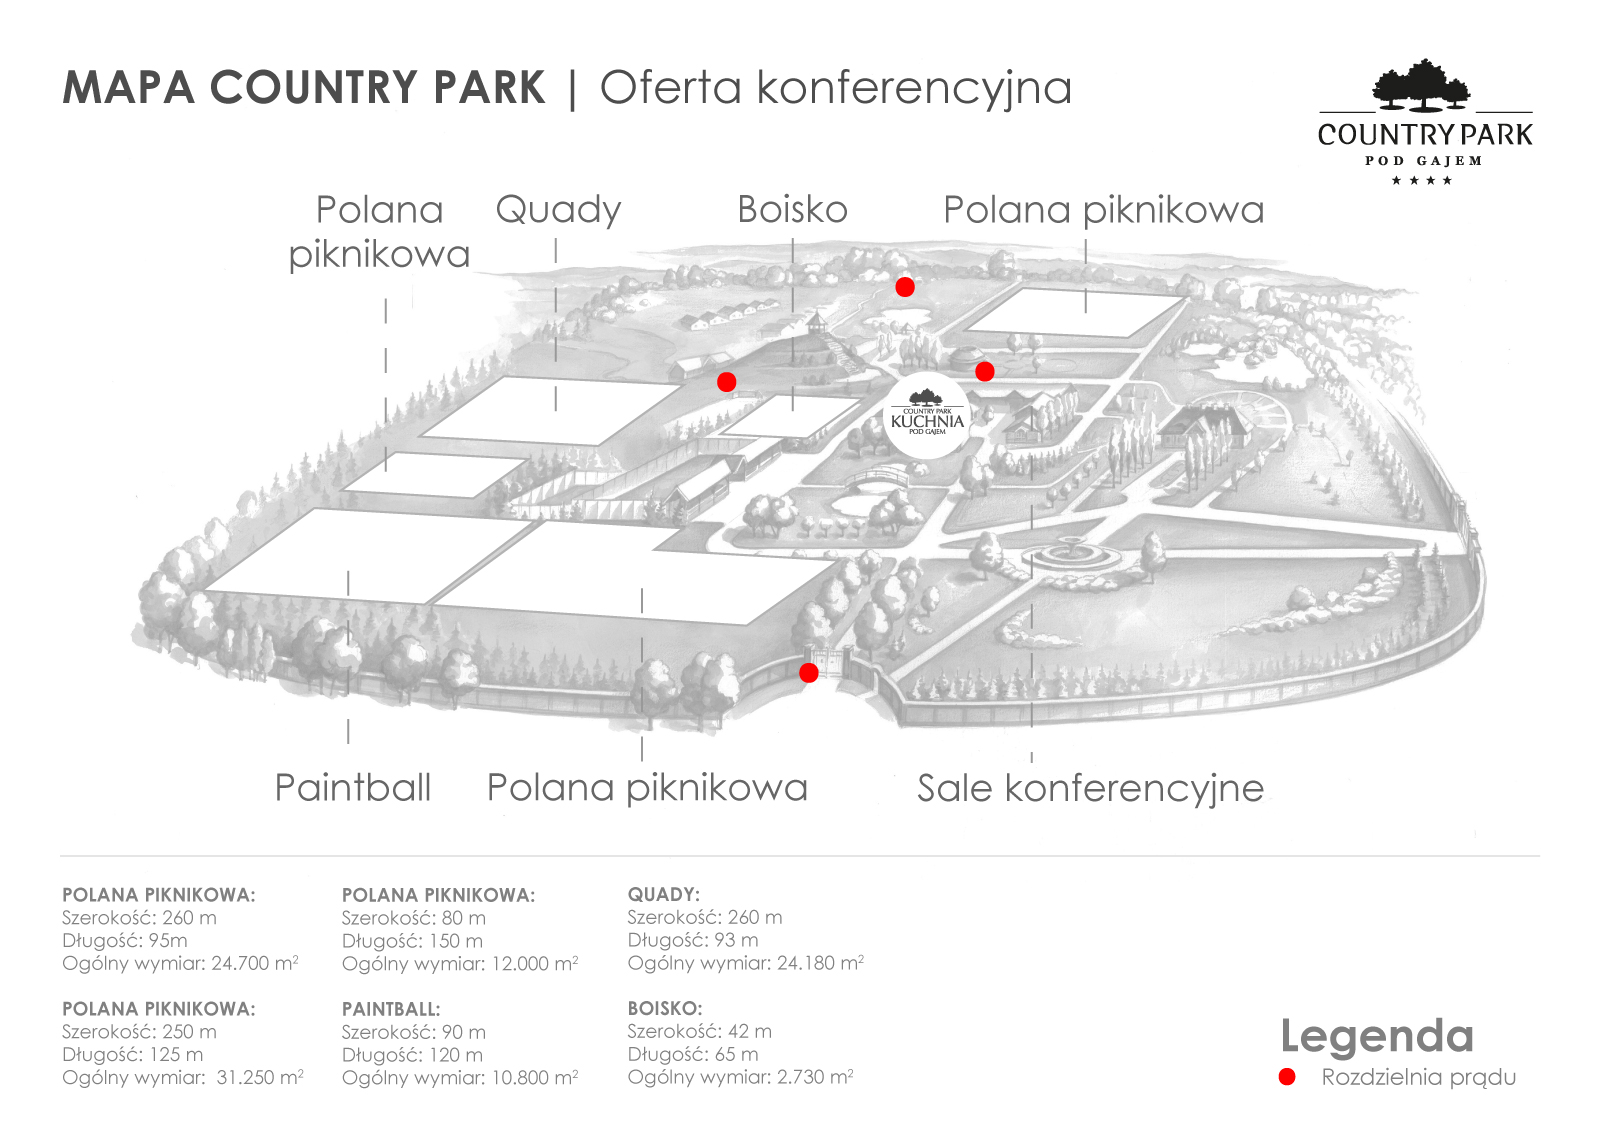 mapa konferencje country park